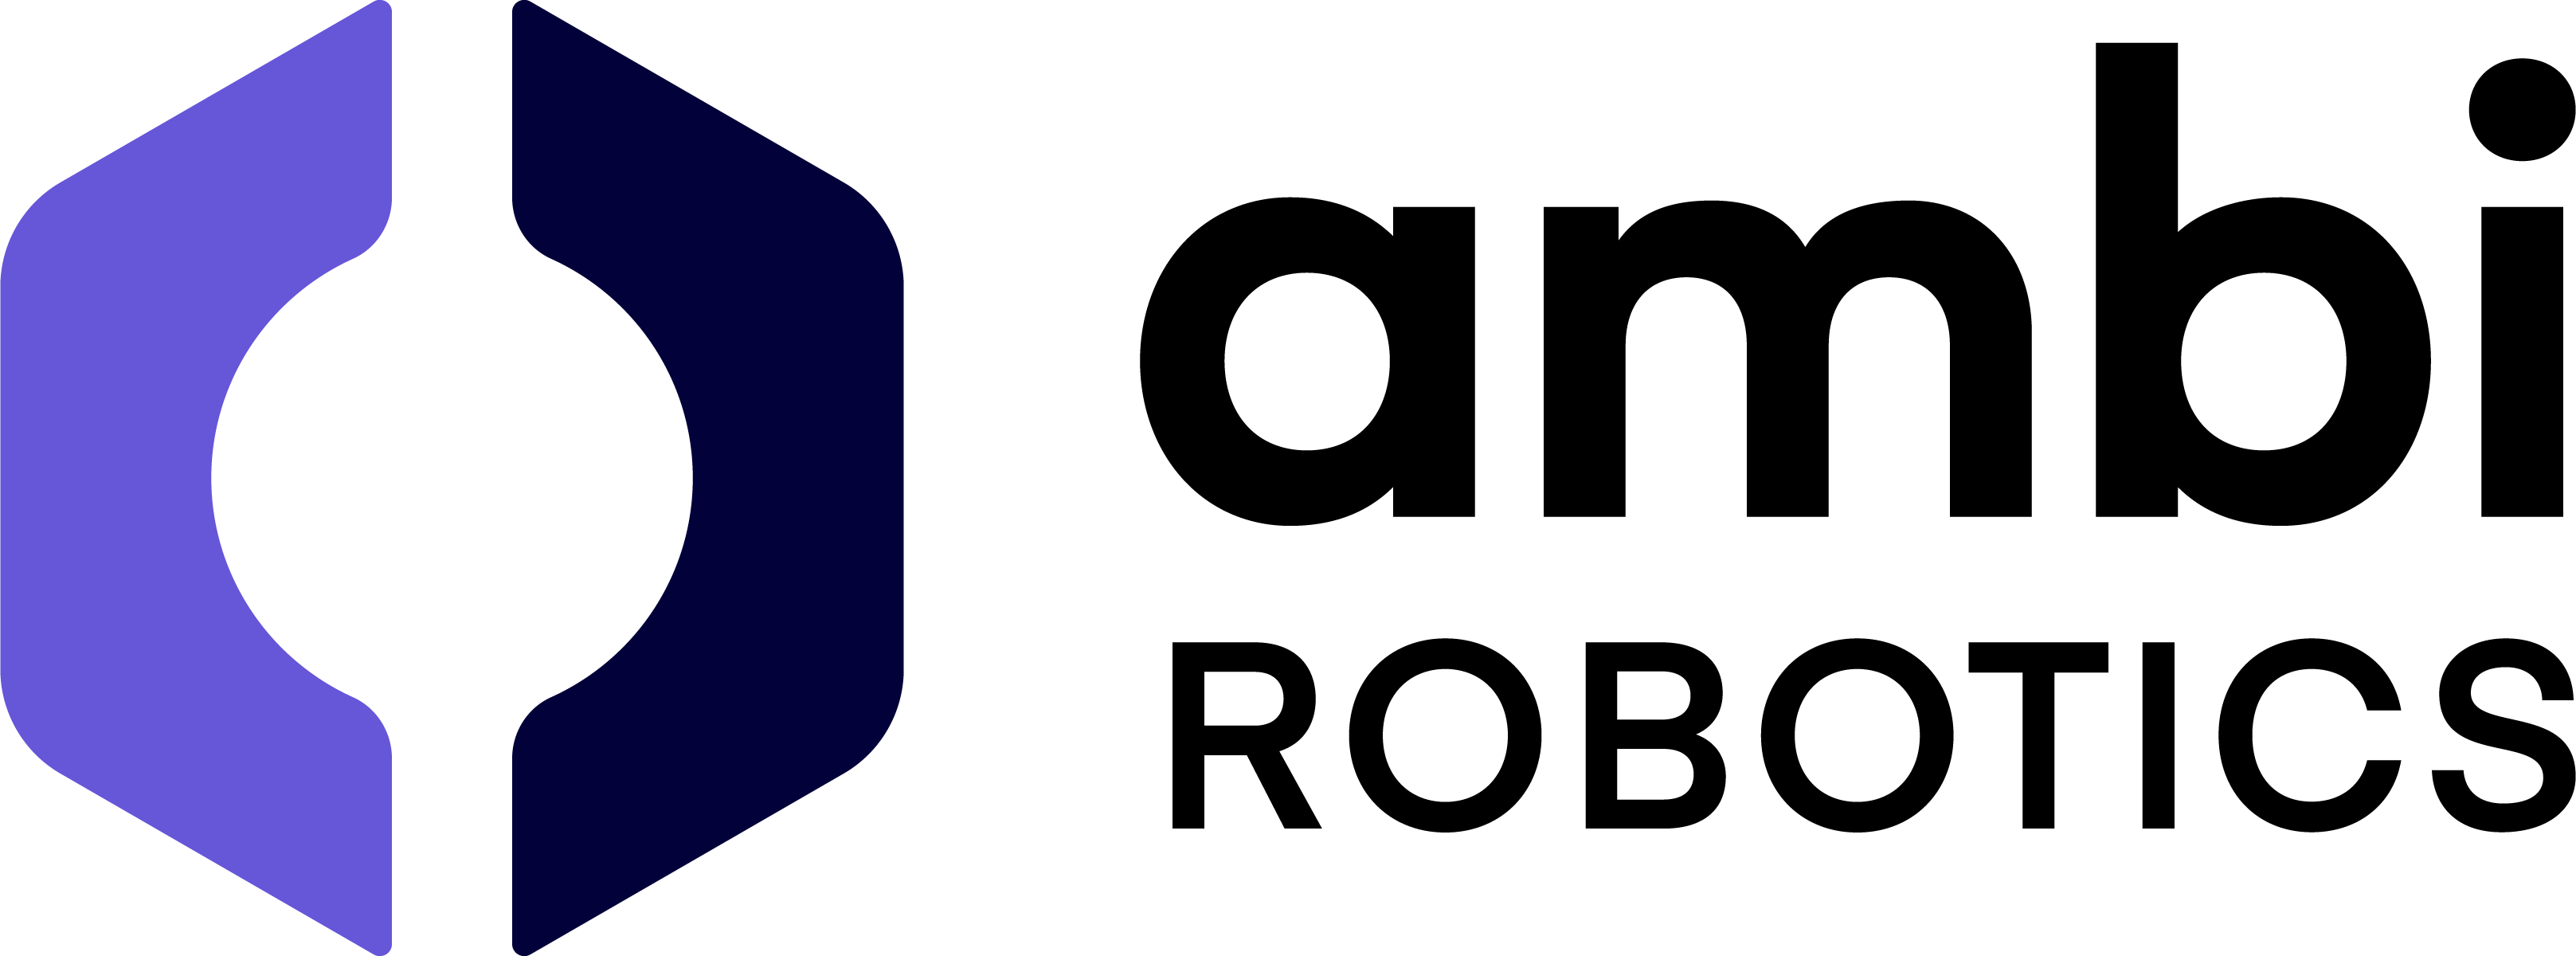 Ambi Robotics logo